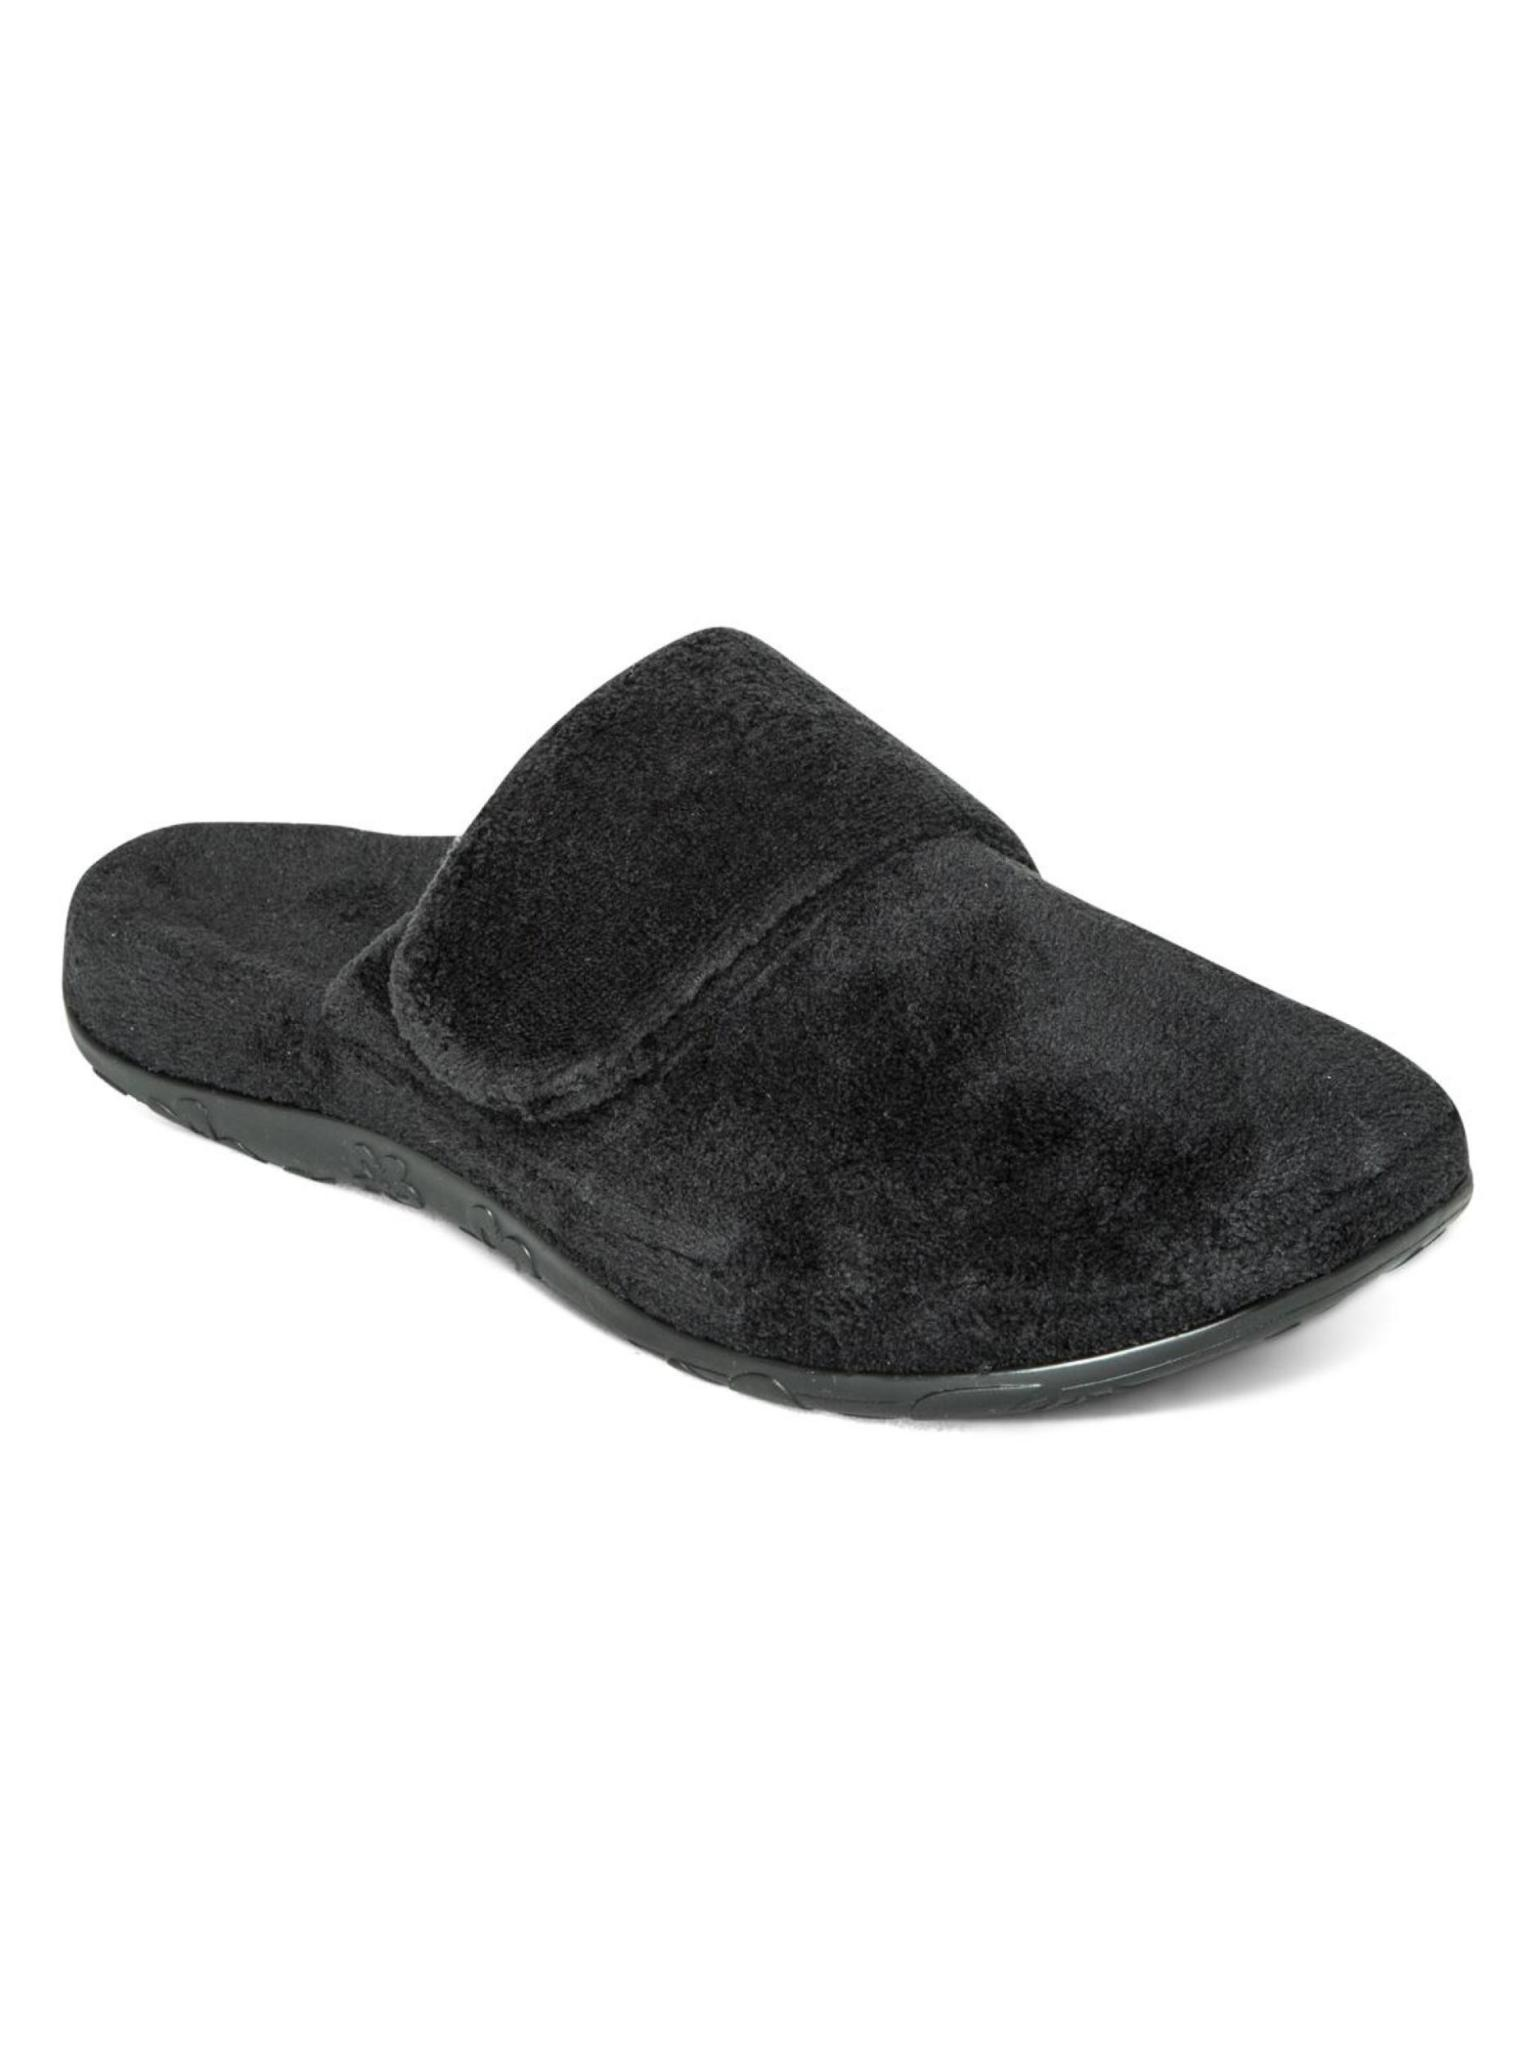 Aetrex Mandy Closed Toe Slipper